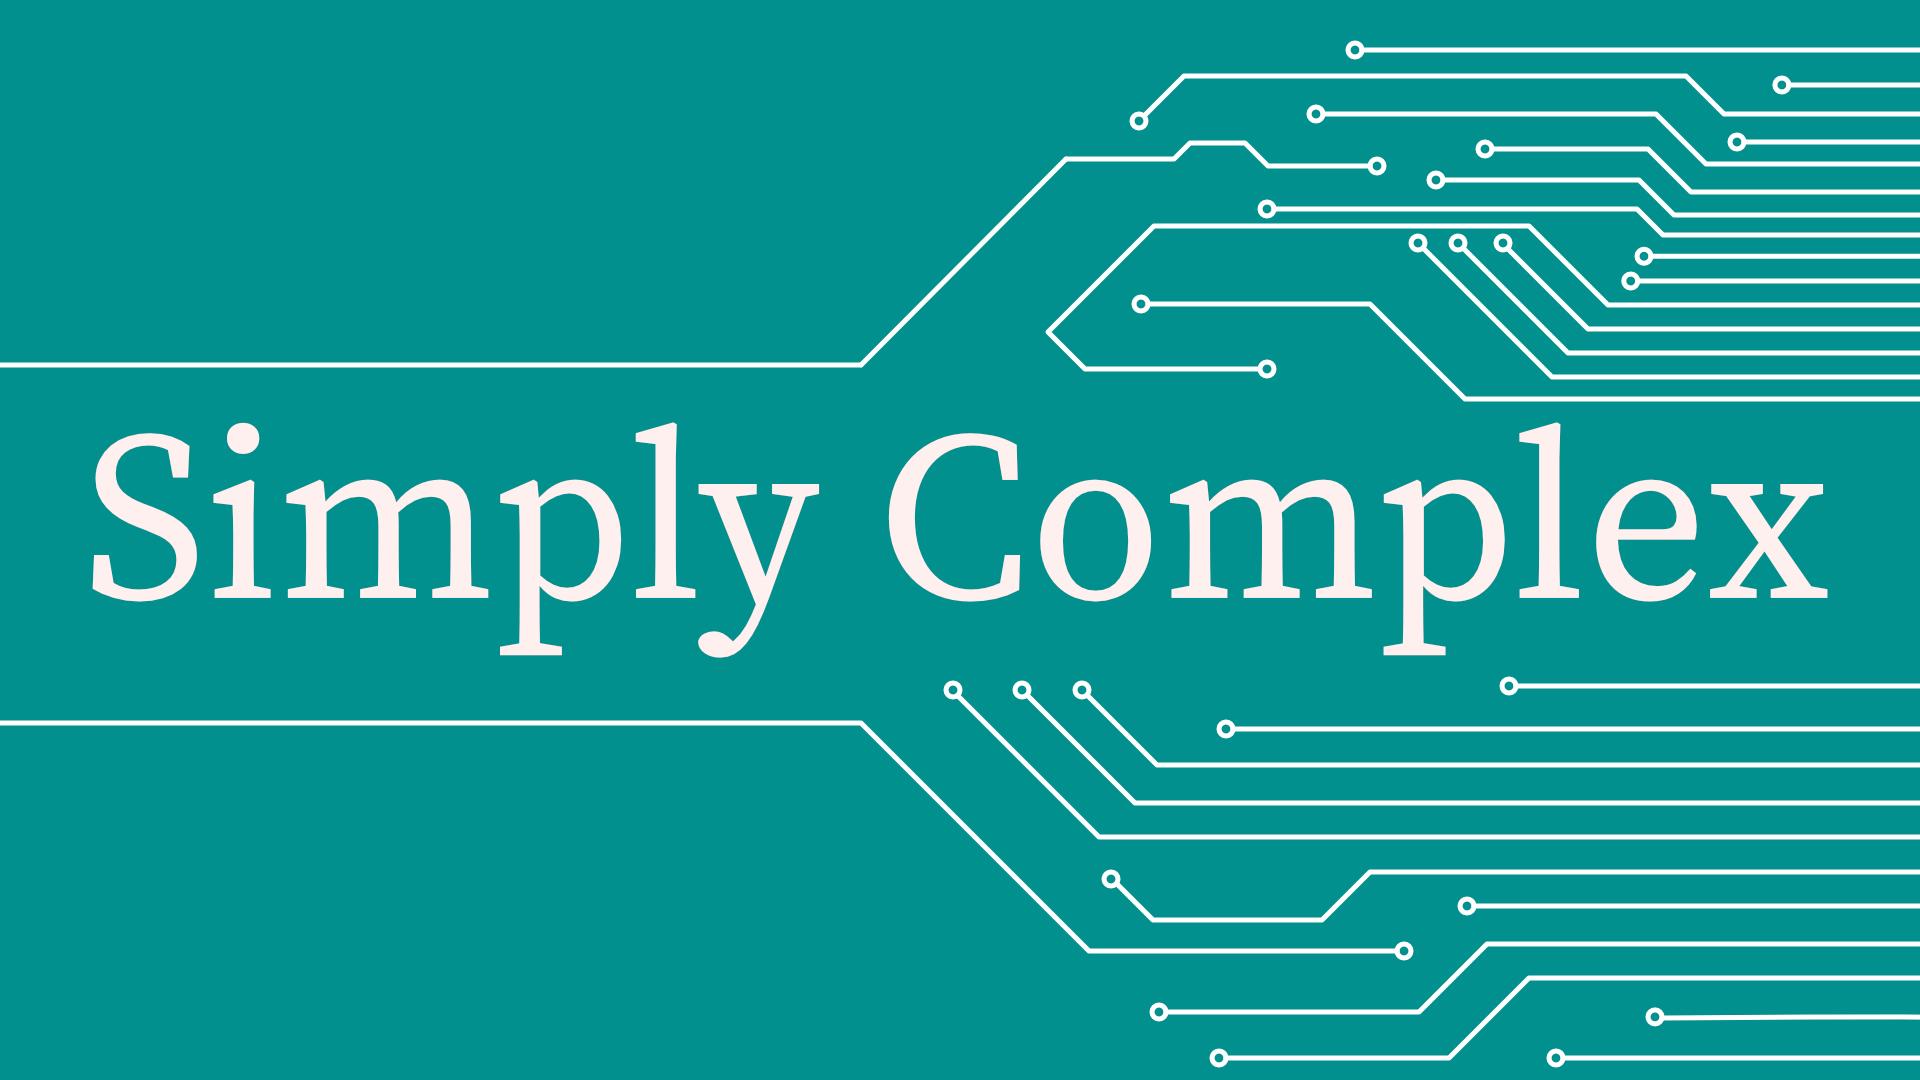 Simply Complex.jpg